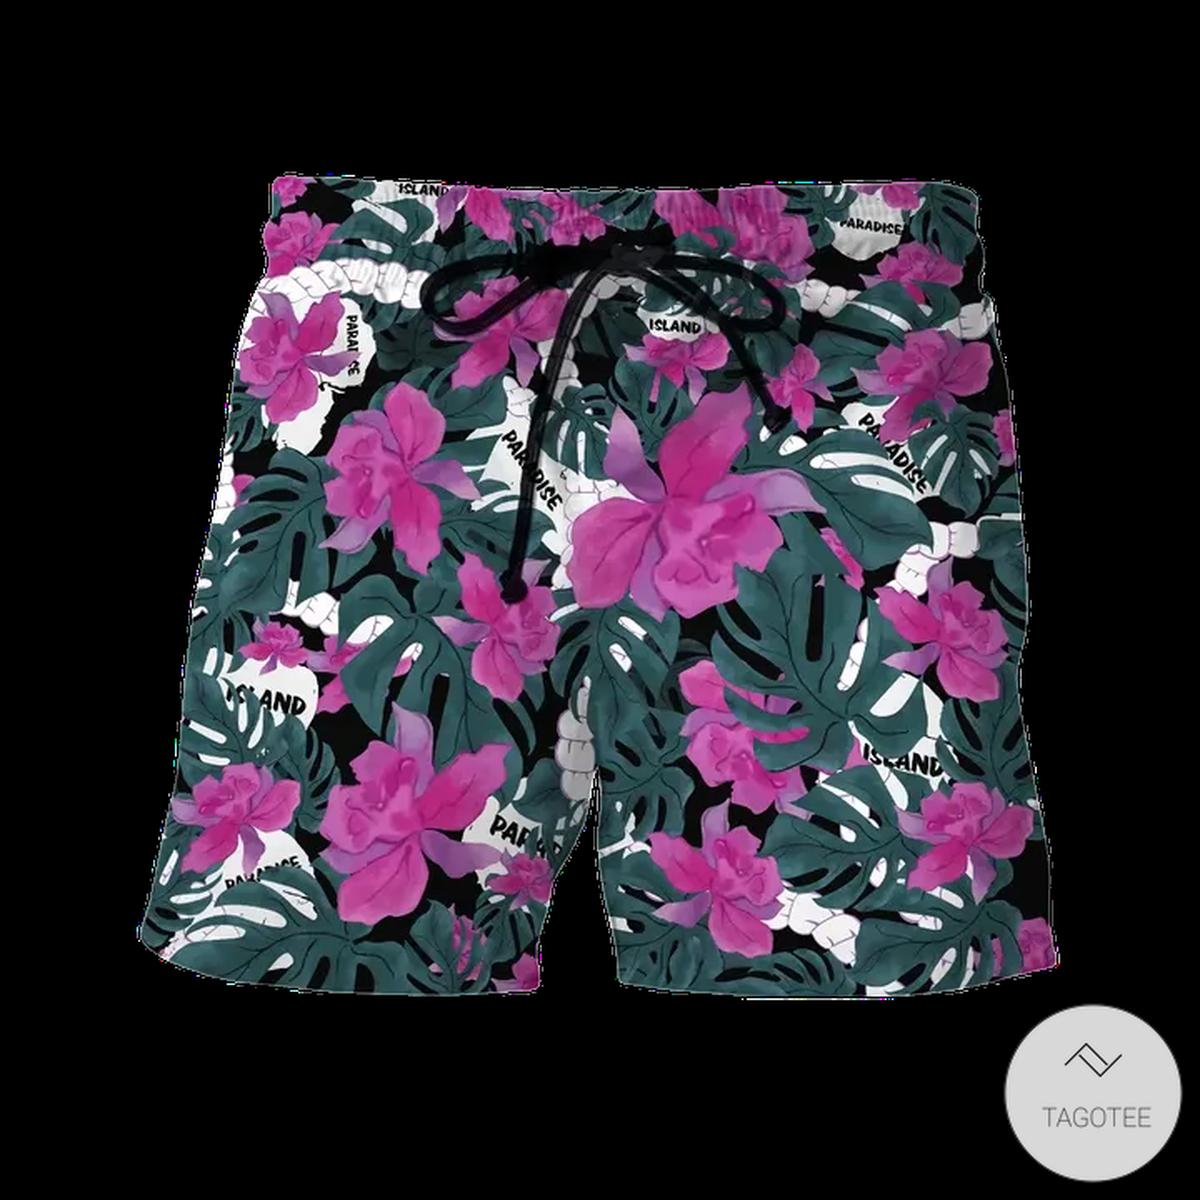 Dennis Nedry Jurassic Park Hawaiian Shirt, Beach Shortsz